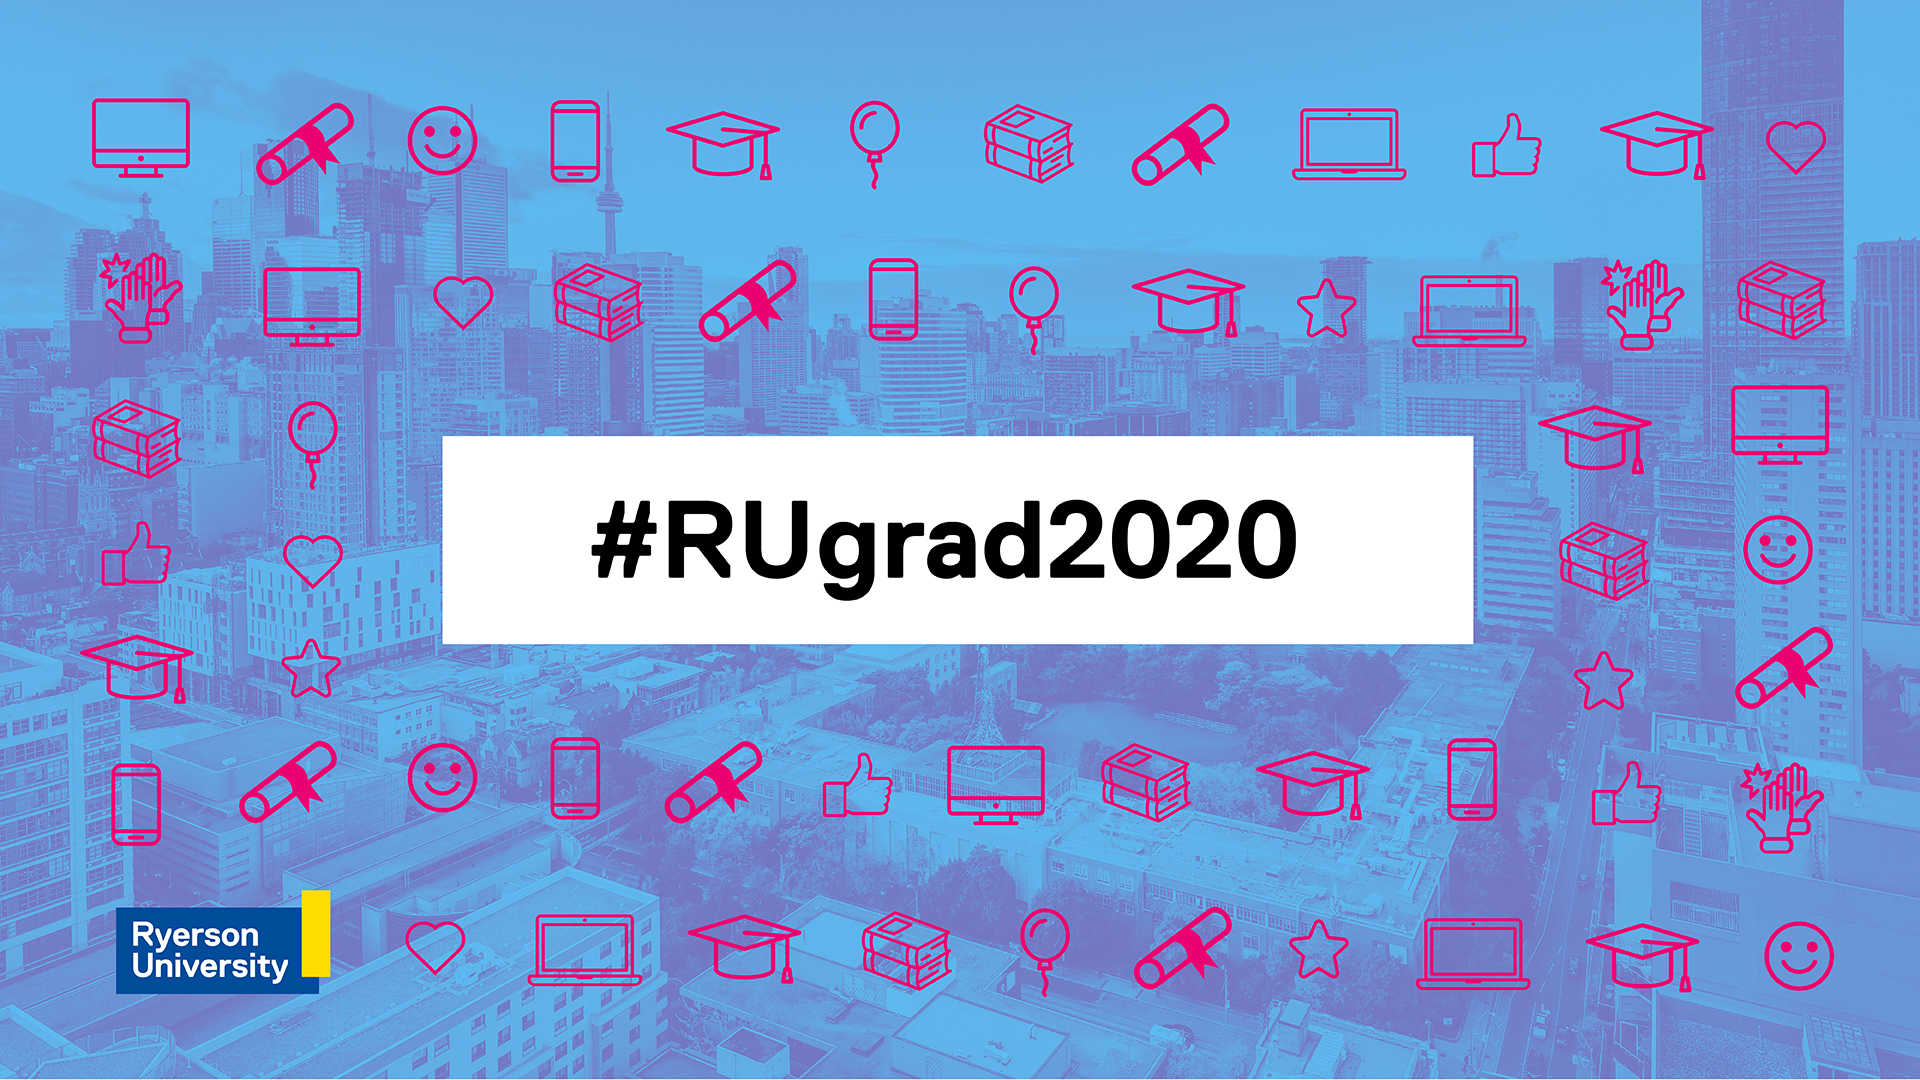 Ryerson Spring Graduation - RUGrad2020